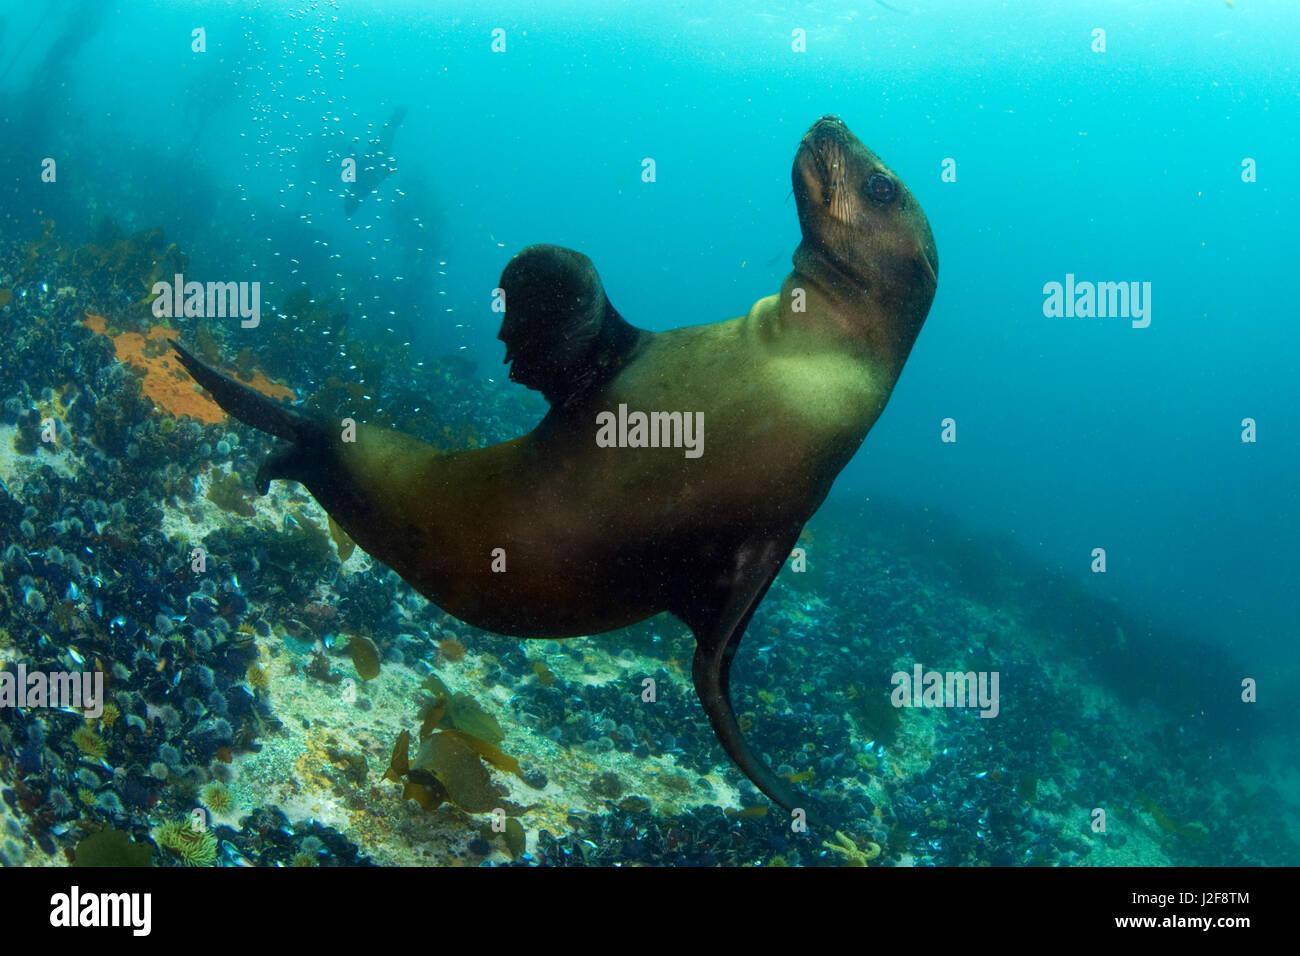 Cape (Arctocephalus pusillus) bajo el agua. Imagen De Stock